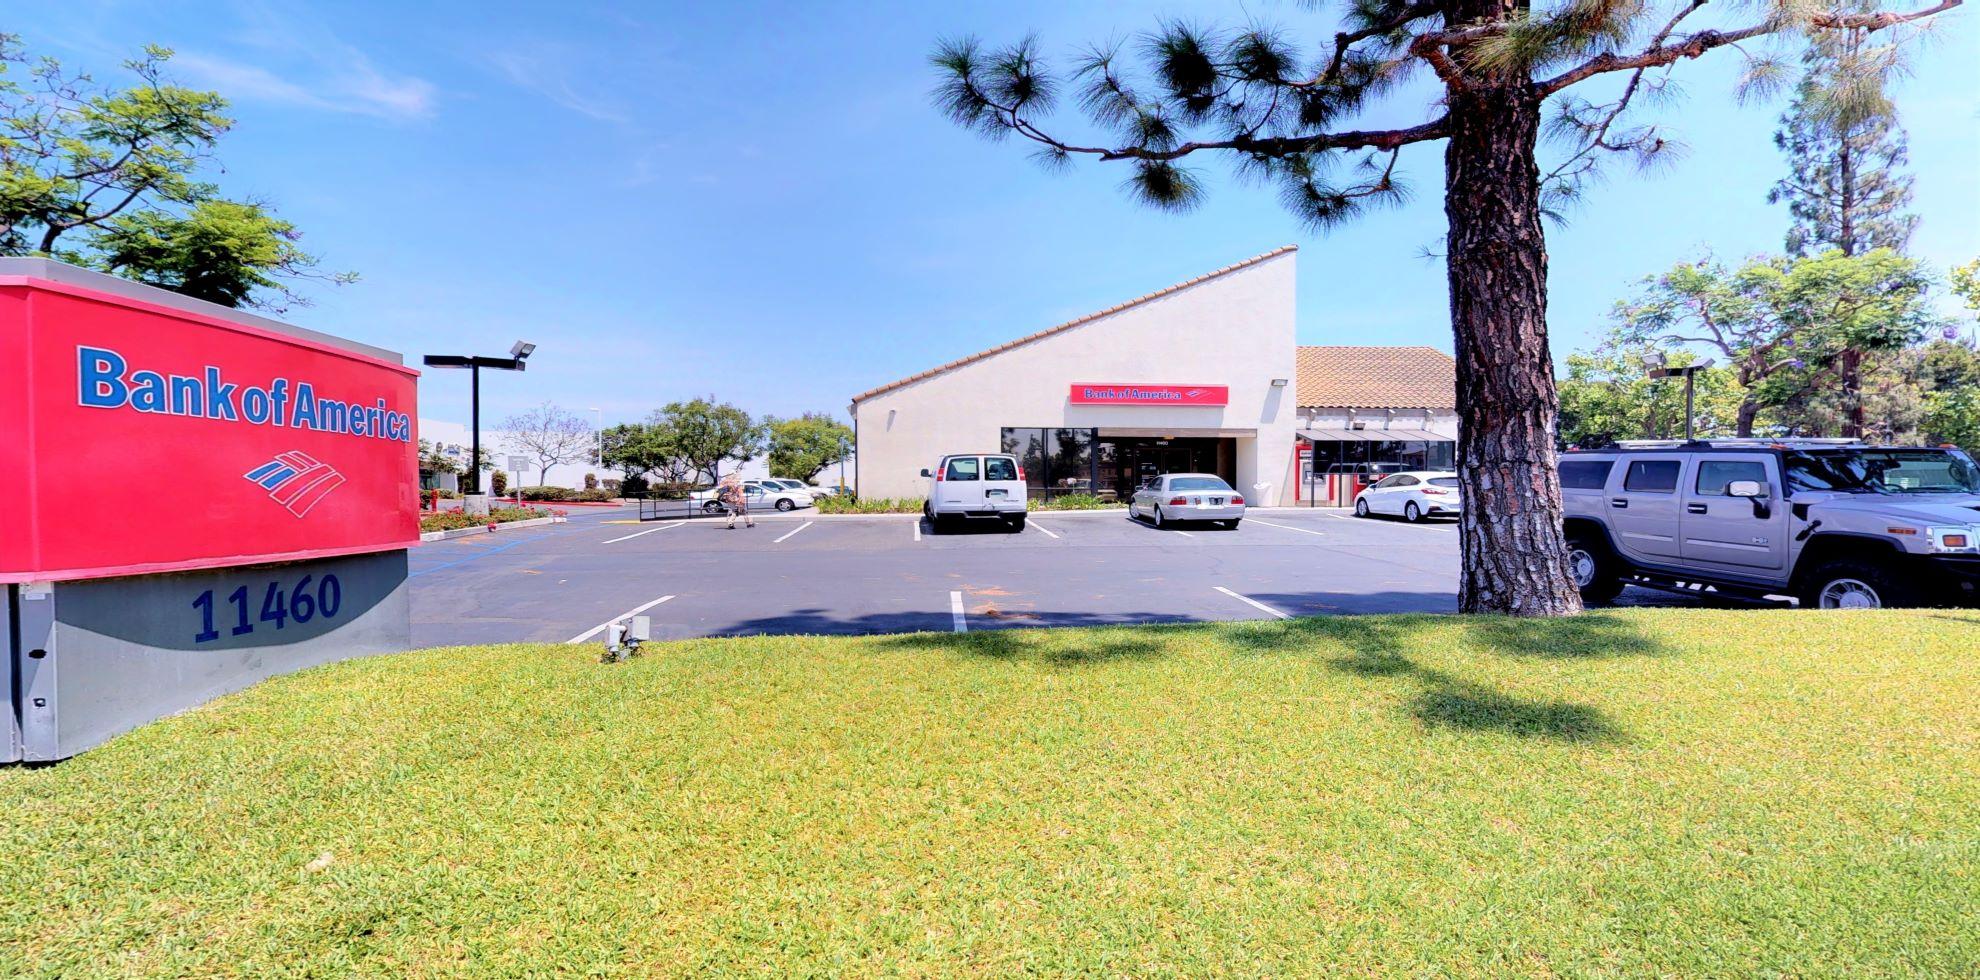 Bank of America financial center with drive-thru ATM   11460 Knott St, Garden Grove, CA 92841